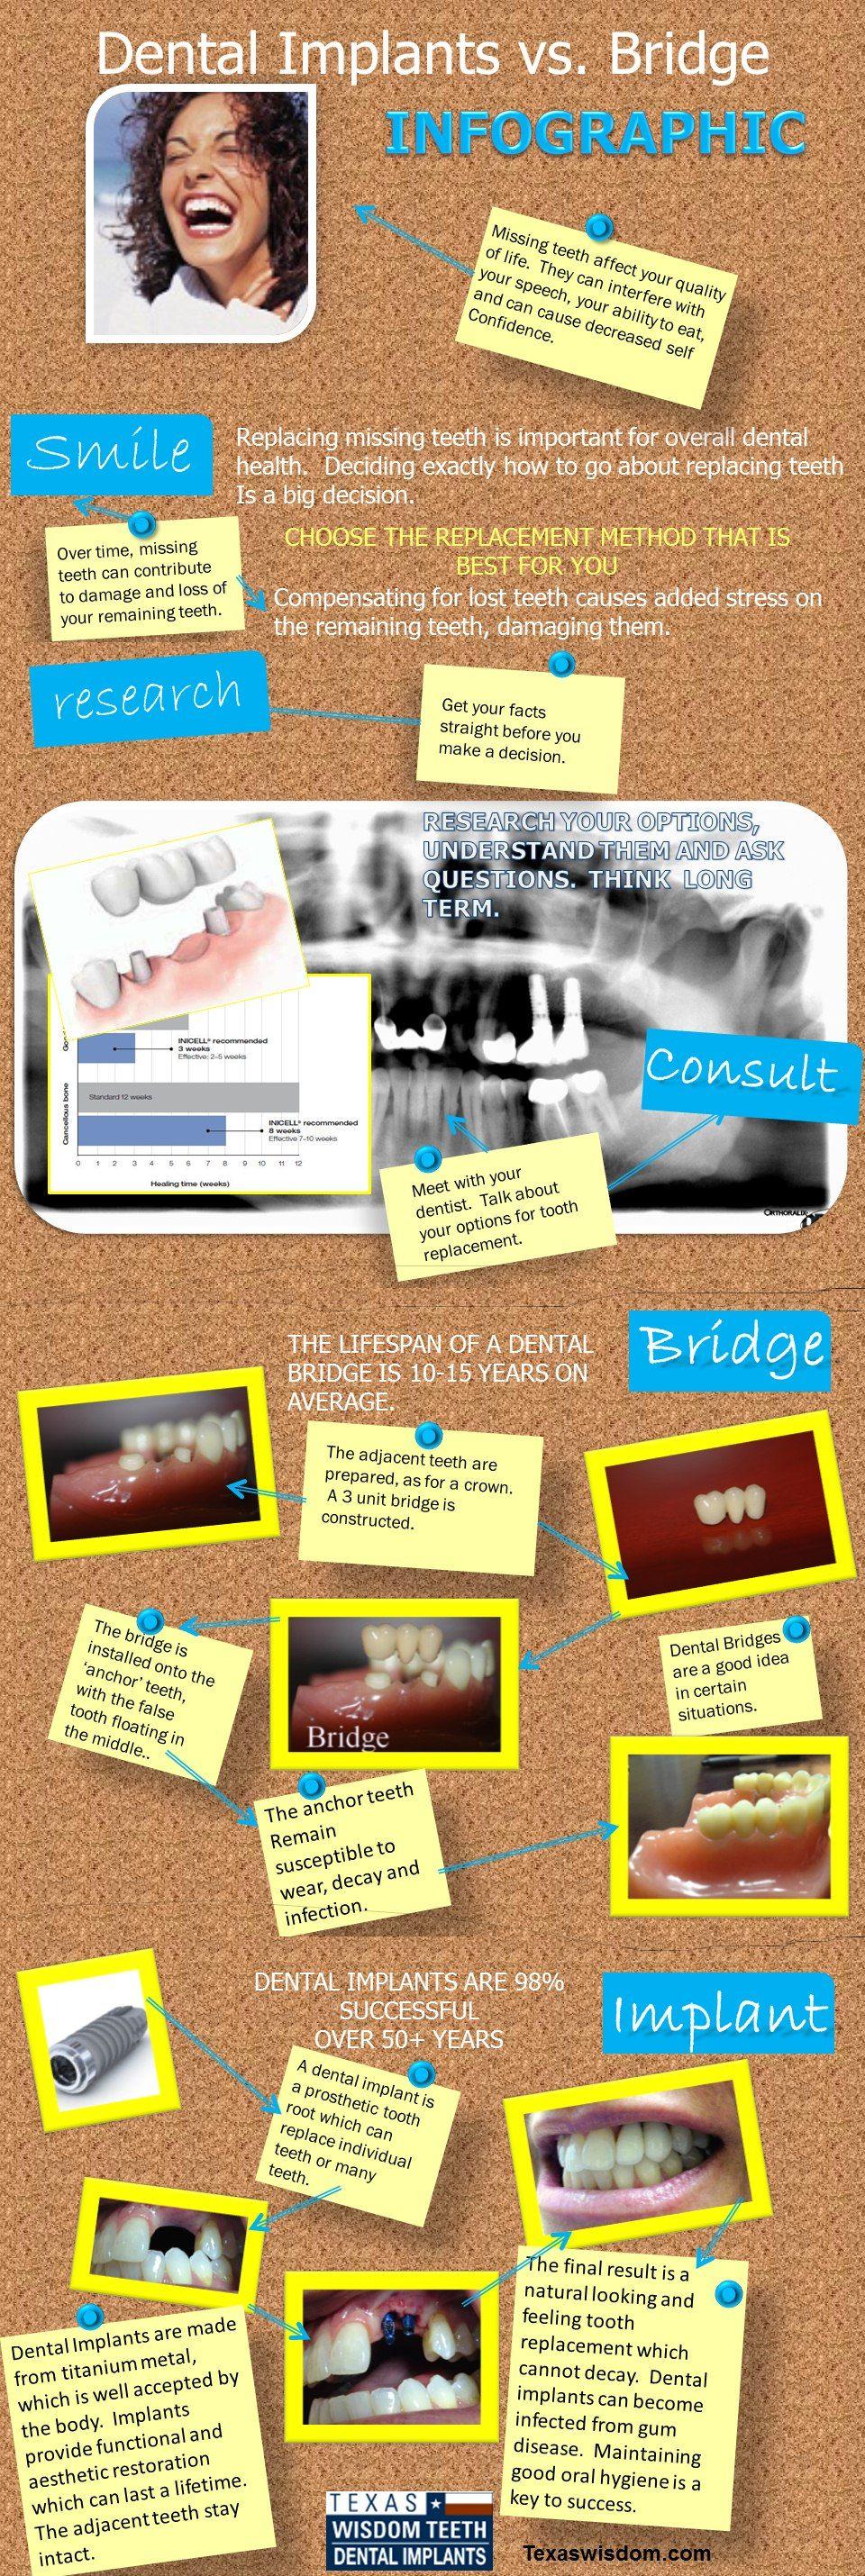 http://blog.texaswisdom.com/wp-content/uploads/2012/10/Implant-vs-Bridge-Infographic-3.jpg